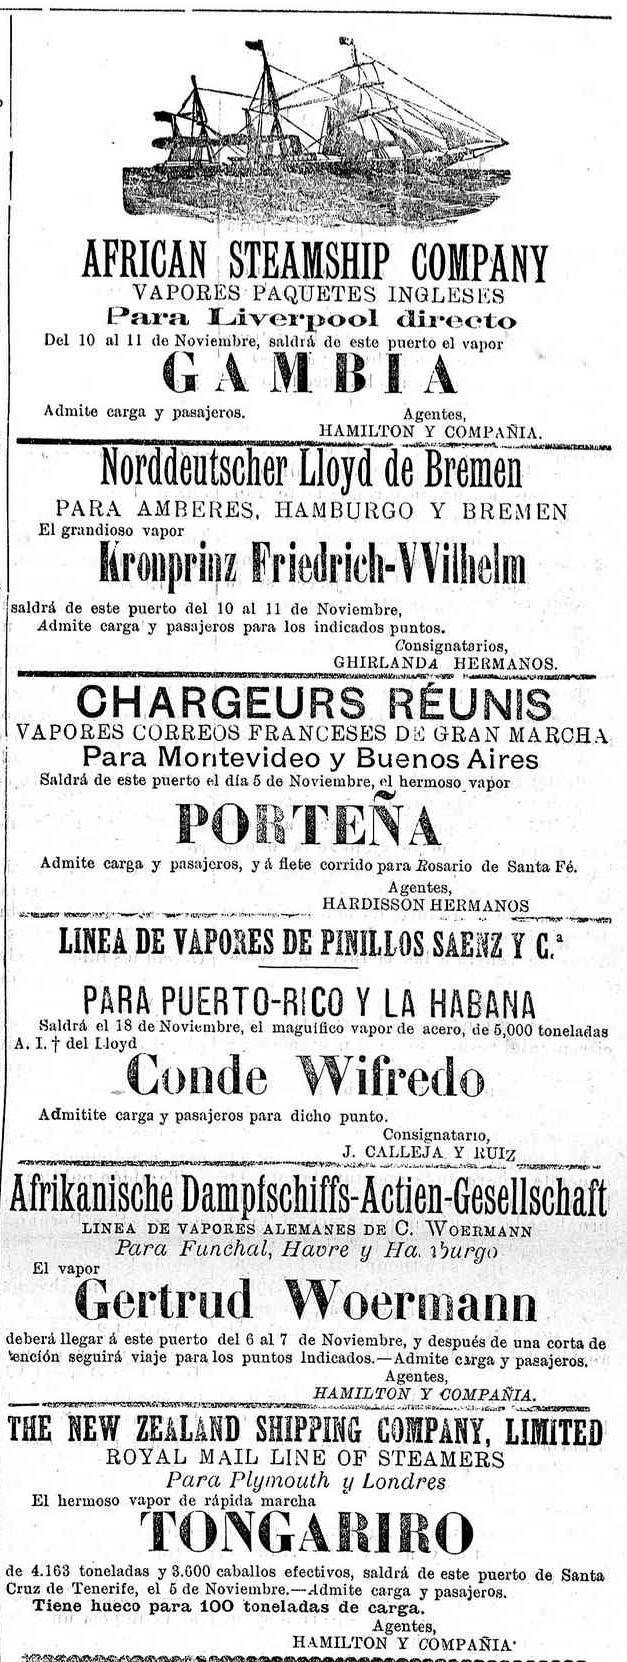 diario-de-tenerife-1890-kronprinz-friedrich-wilhelm.jpg